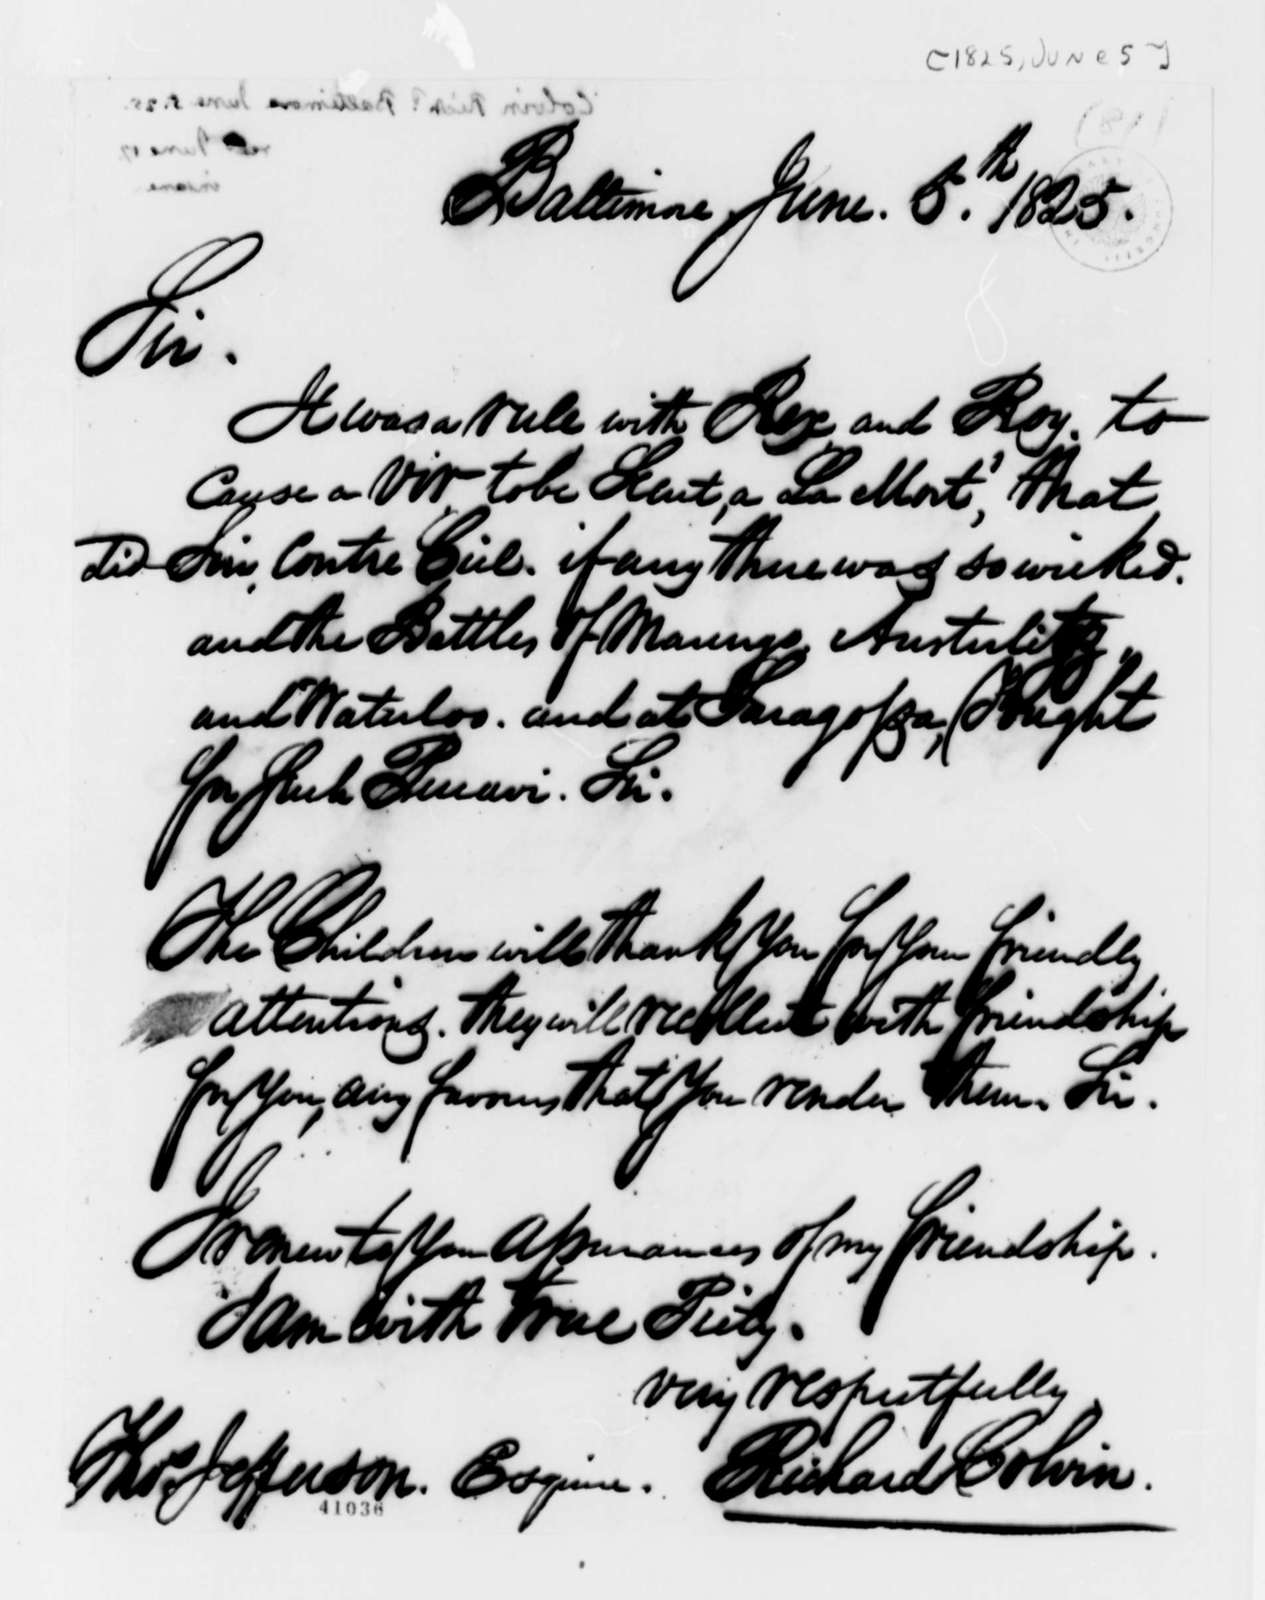 Richard Colvin to Thomas Jefferson, June 5, 1825